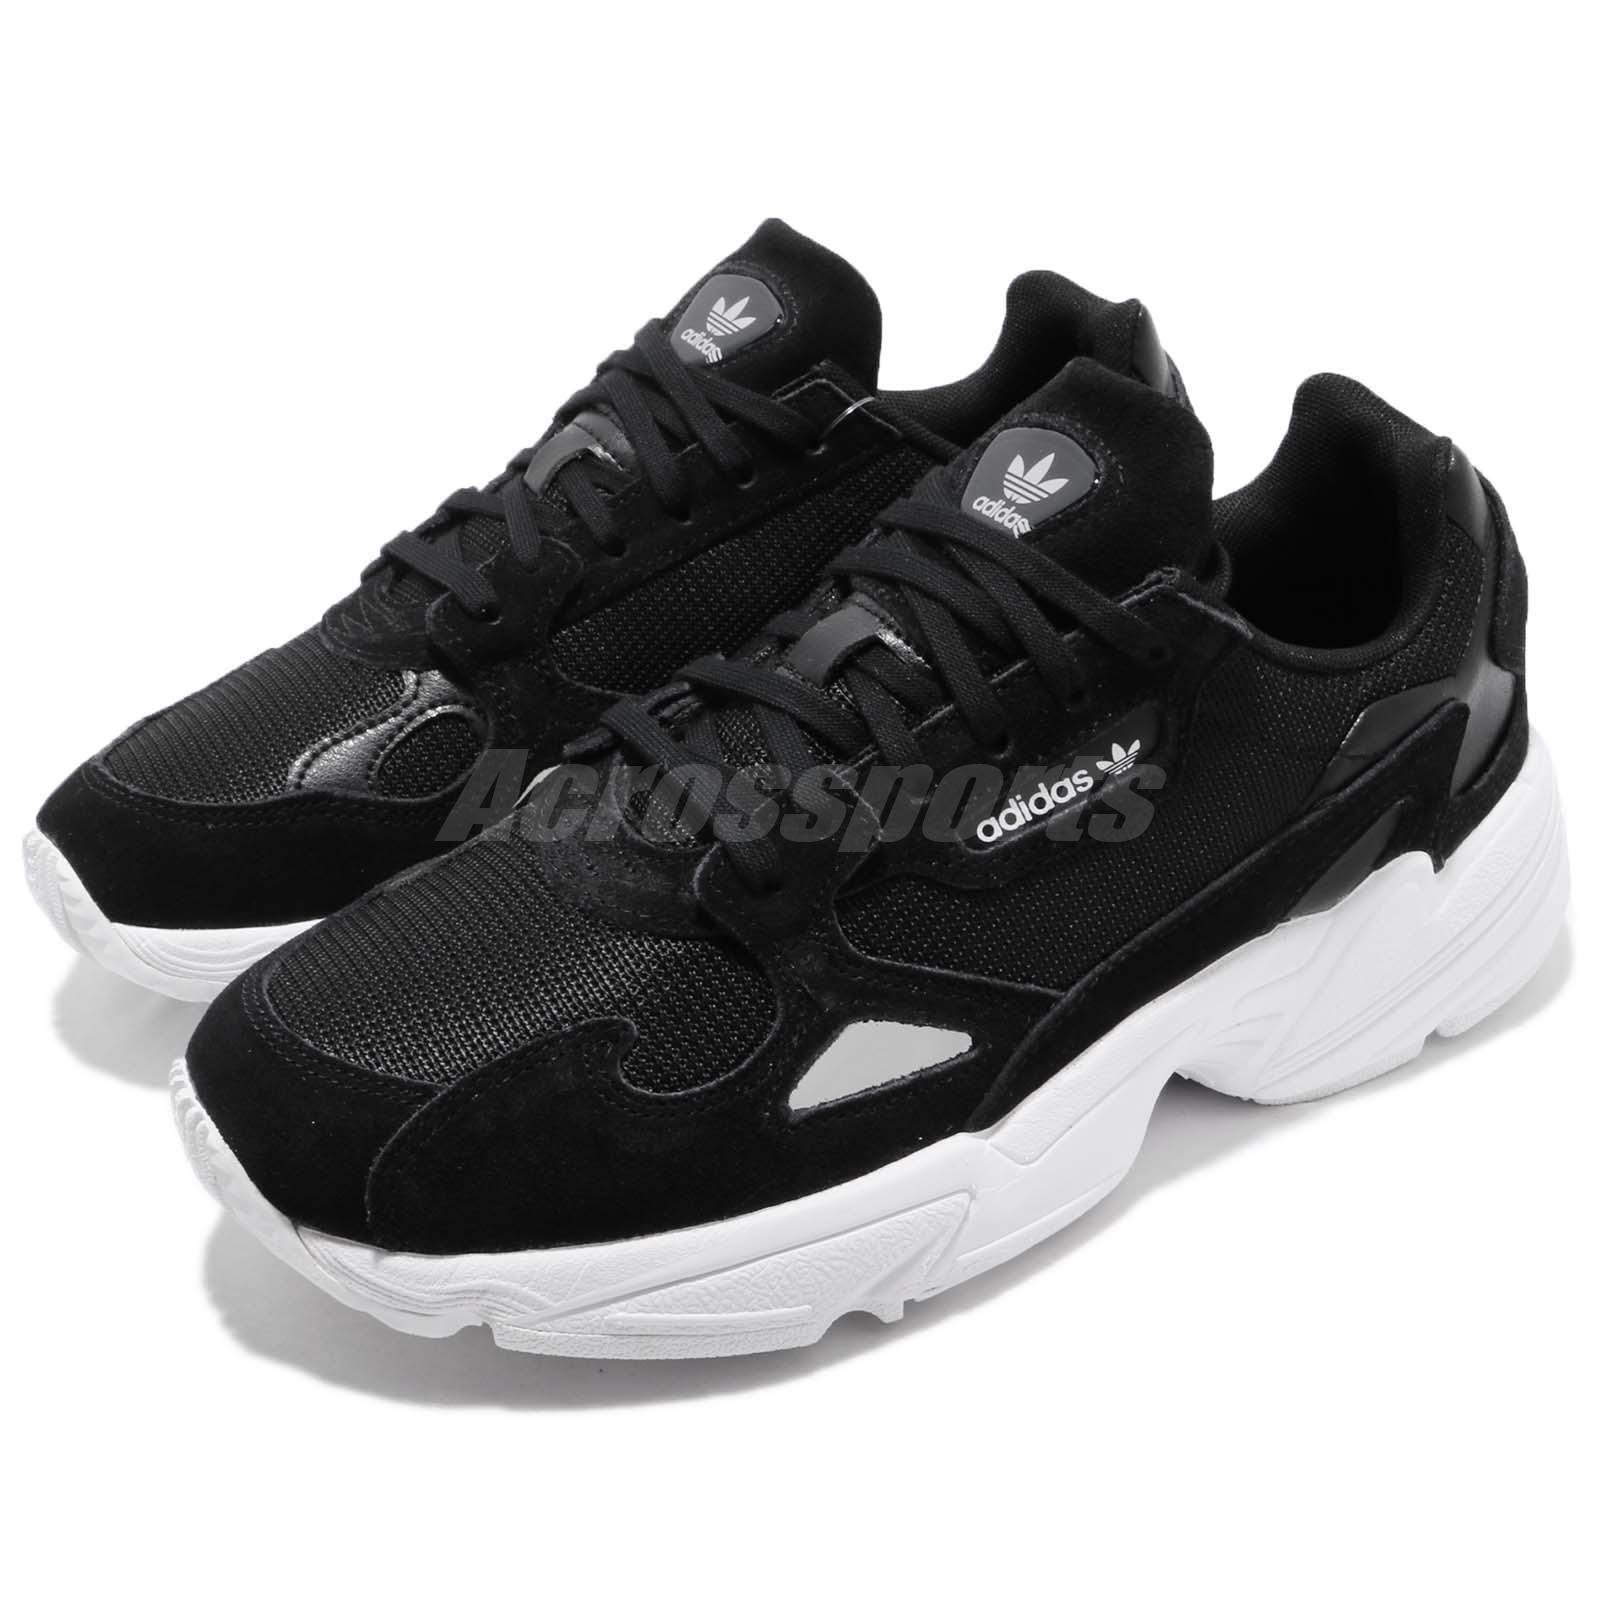 White Black Wo Originals Shoes W Chunky Falcon Adidas wIX7PqY